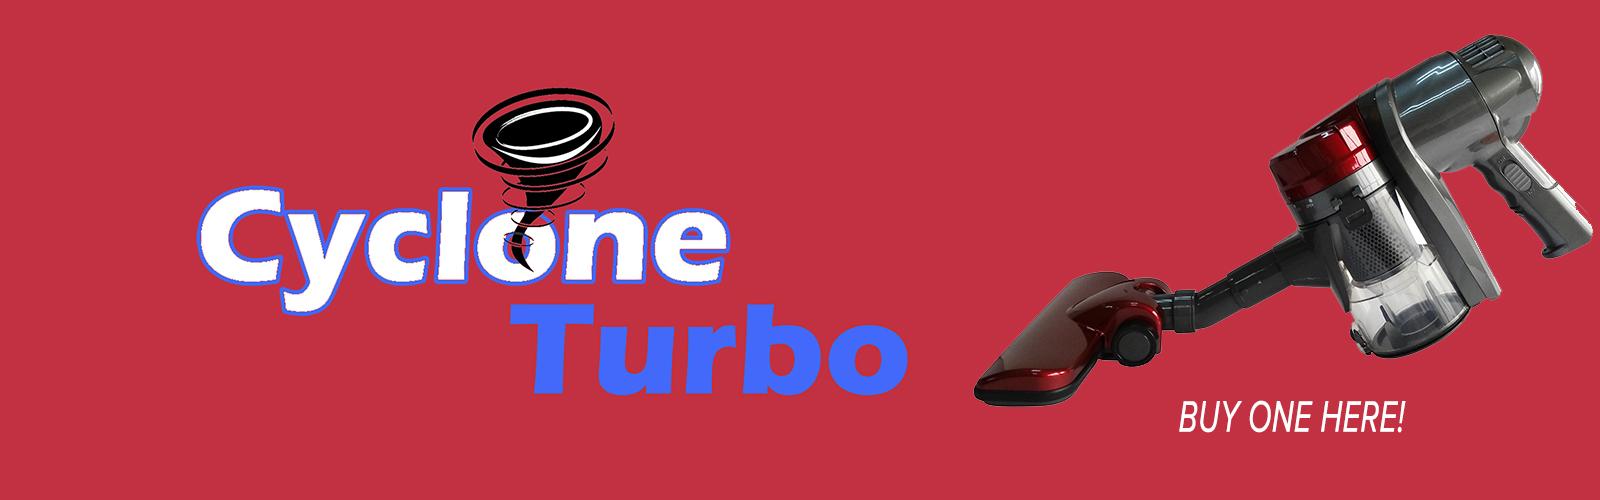 Cyclone Turbo Vac